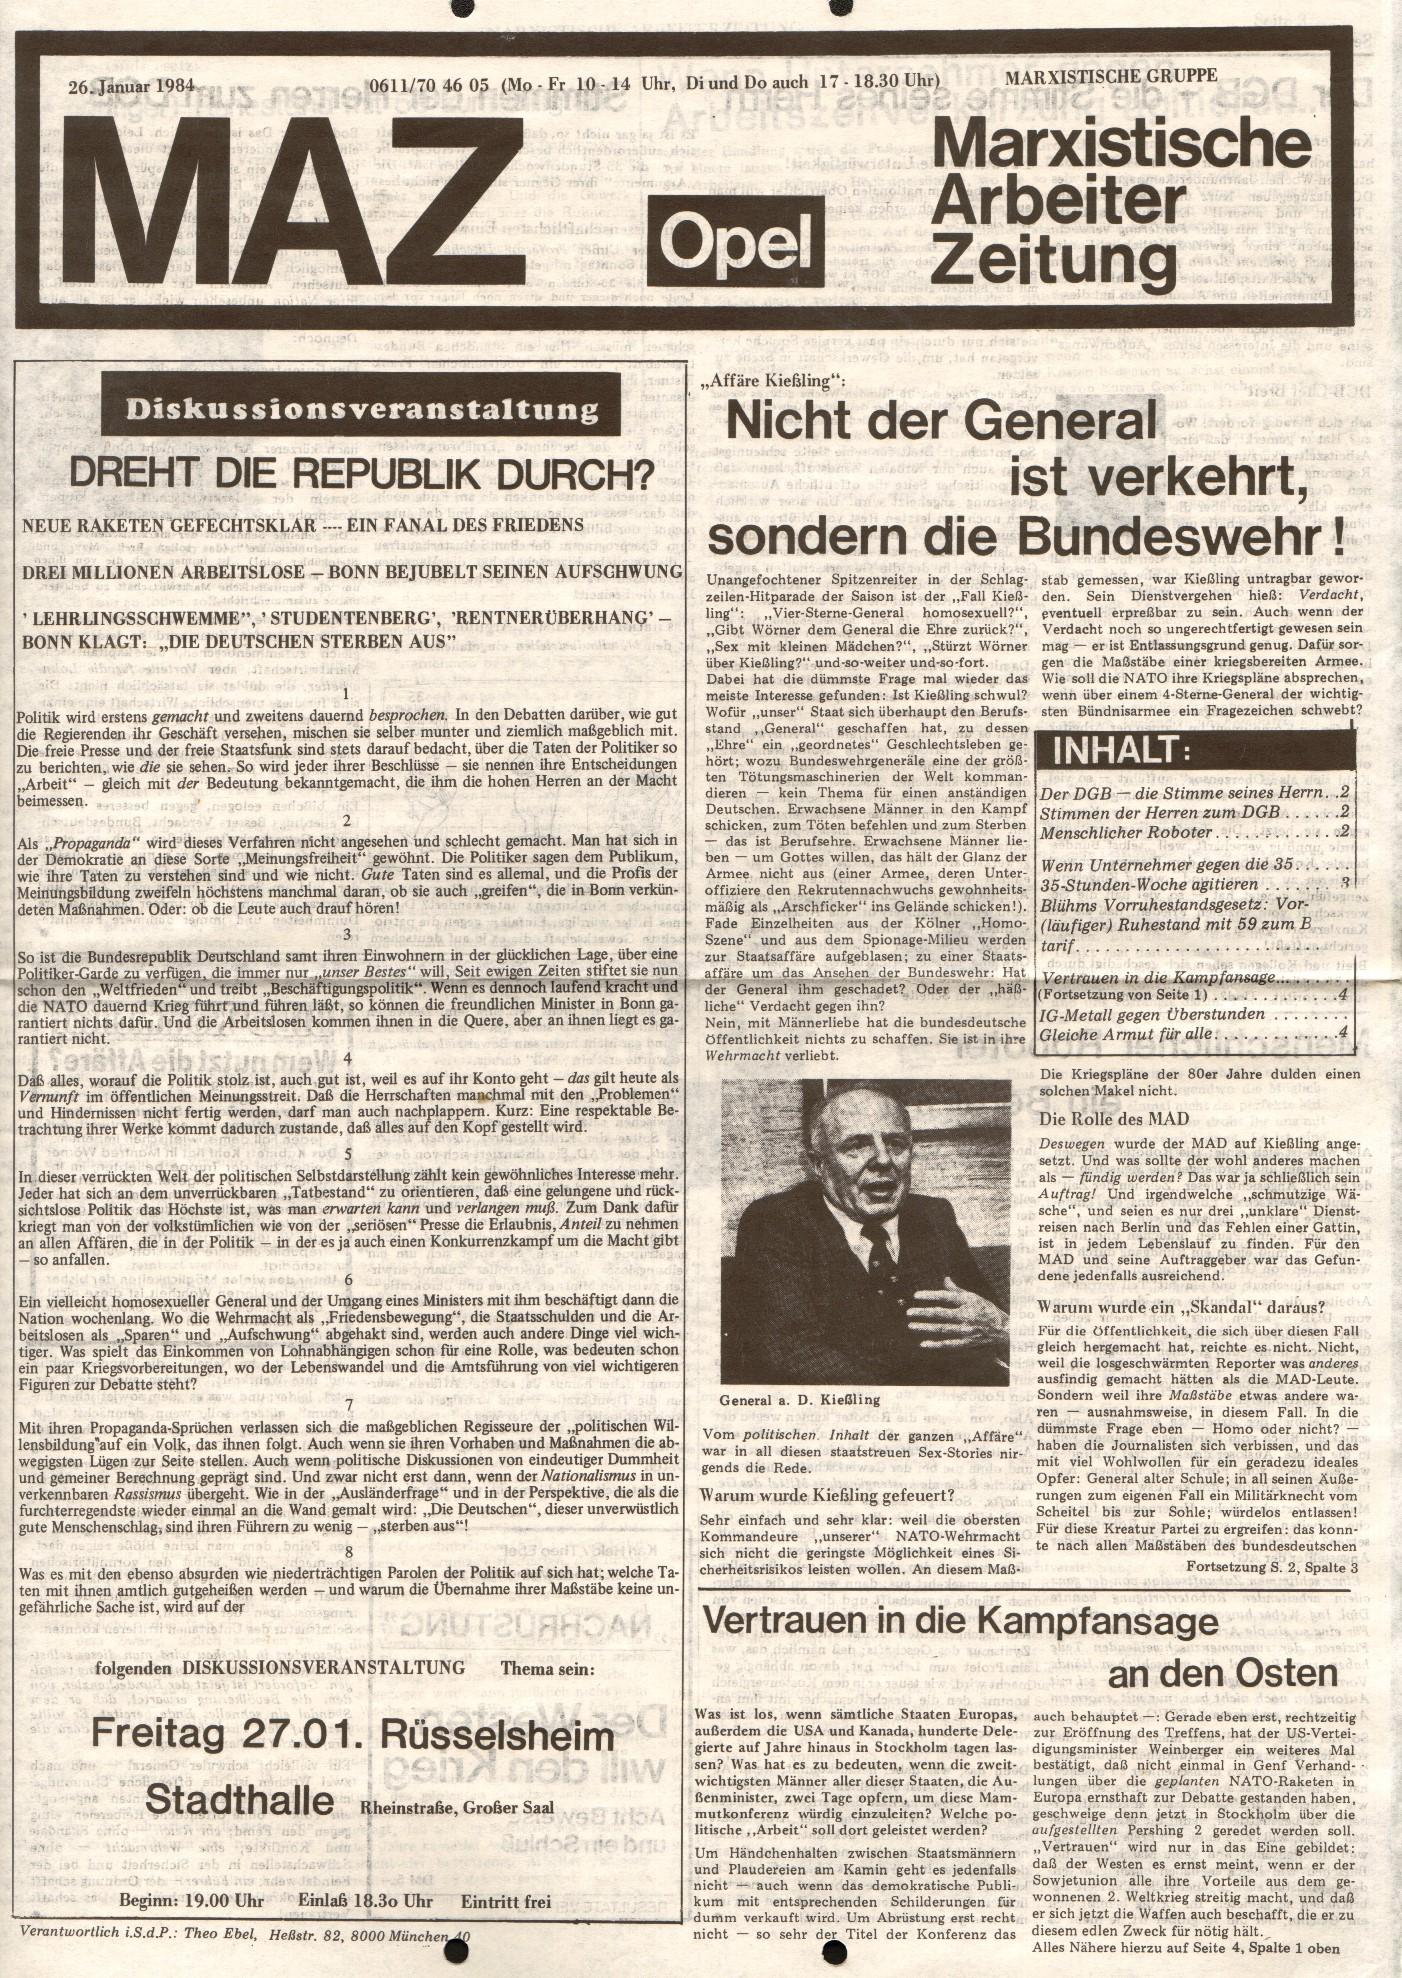 Ruesselsheim_MG_Marxistische_Arbeiterzeitung_Opel_19840126_01